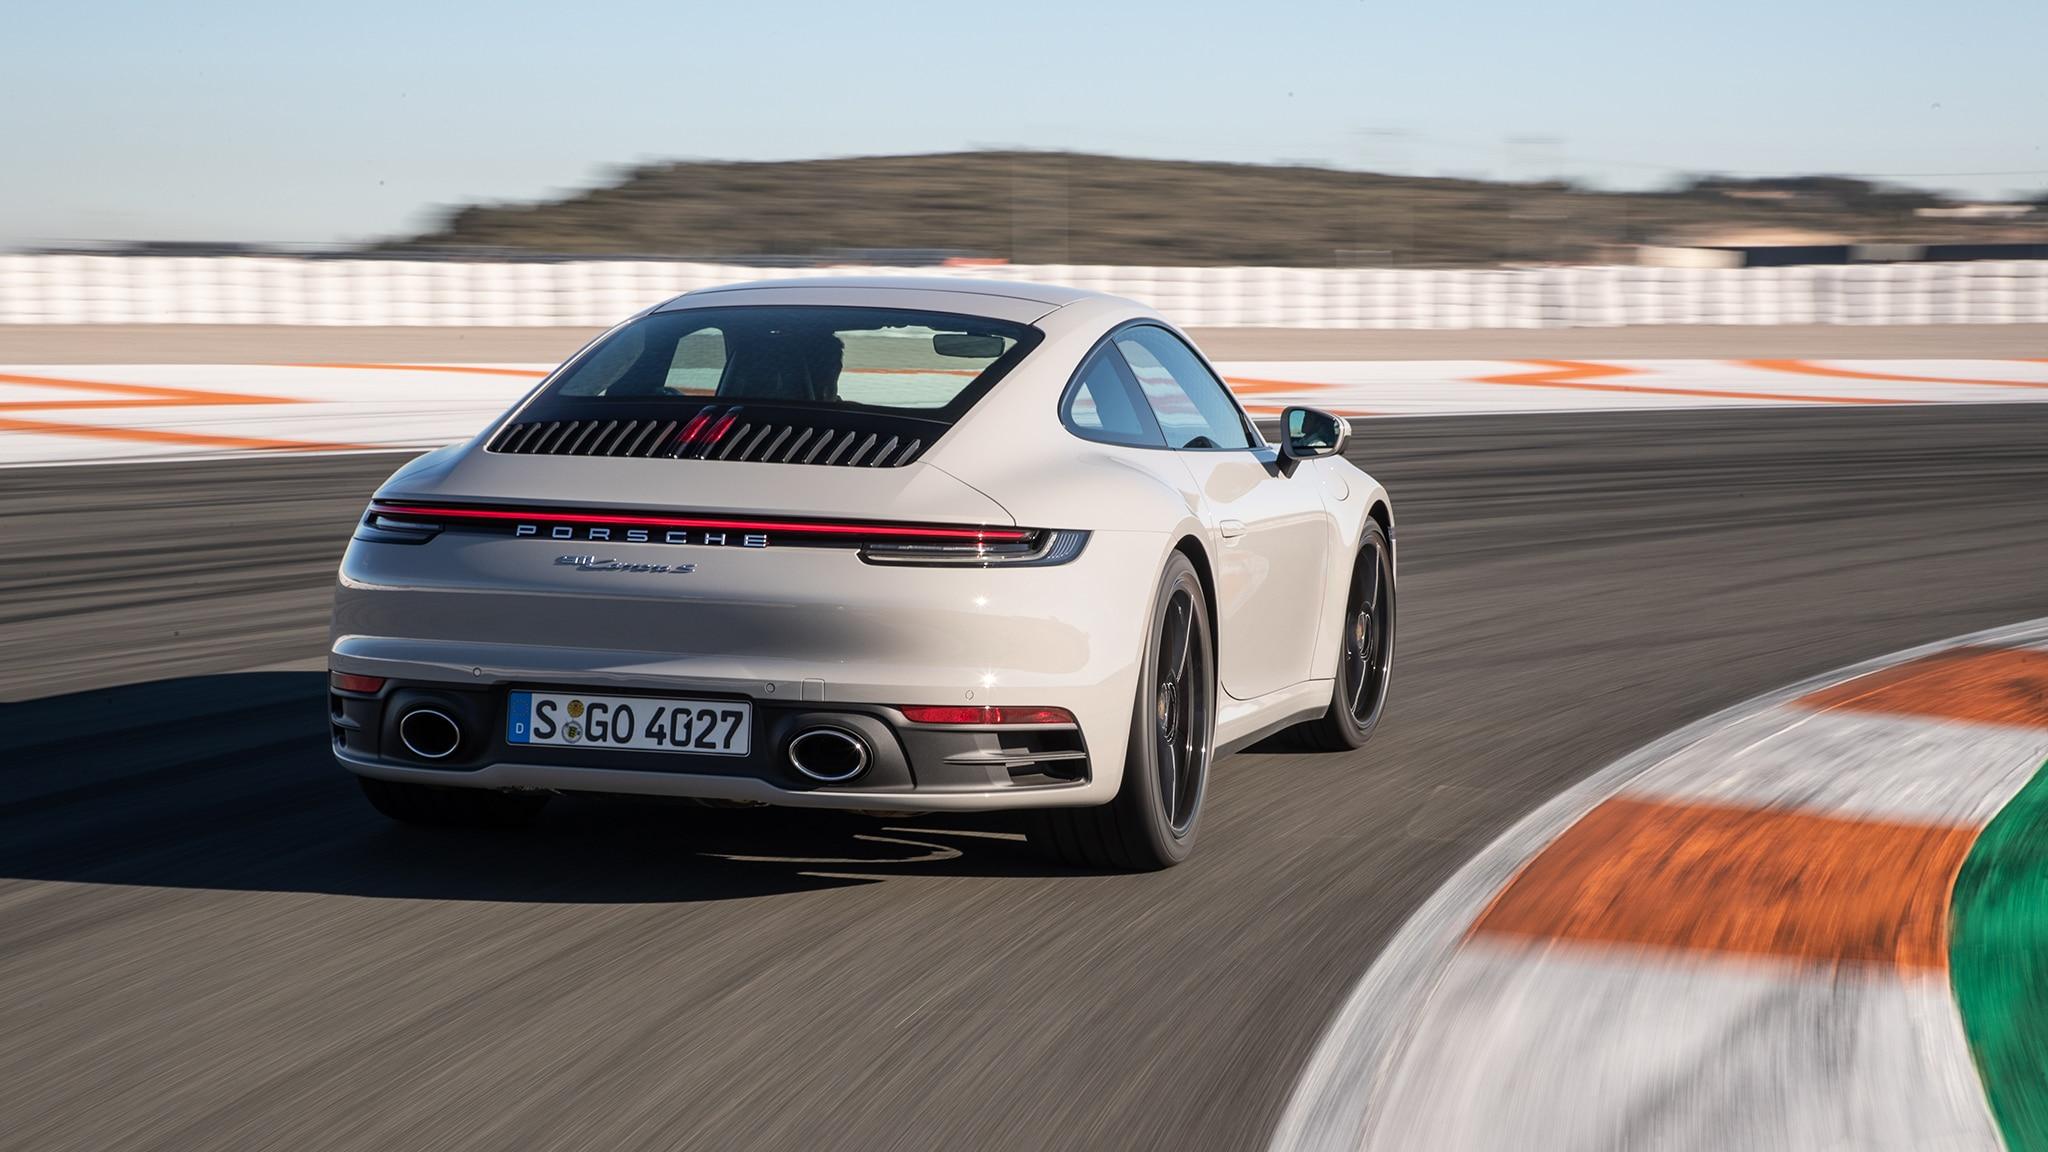 2020 Porsche 911 Carrera S First Drive Review: It's ...